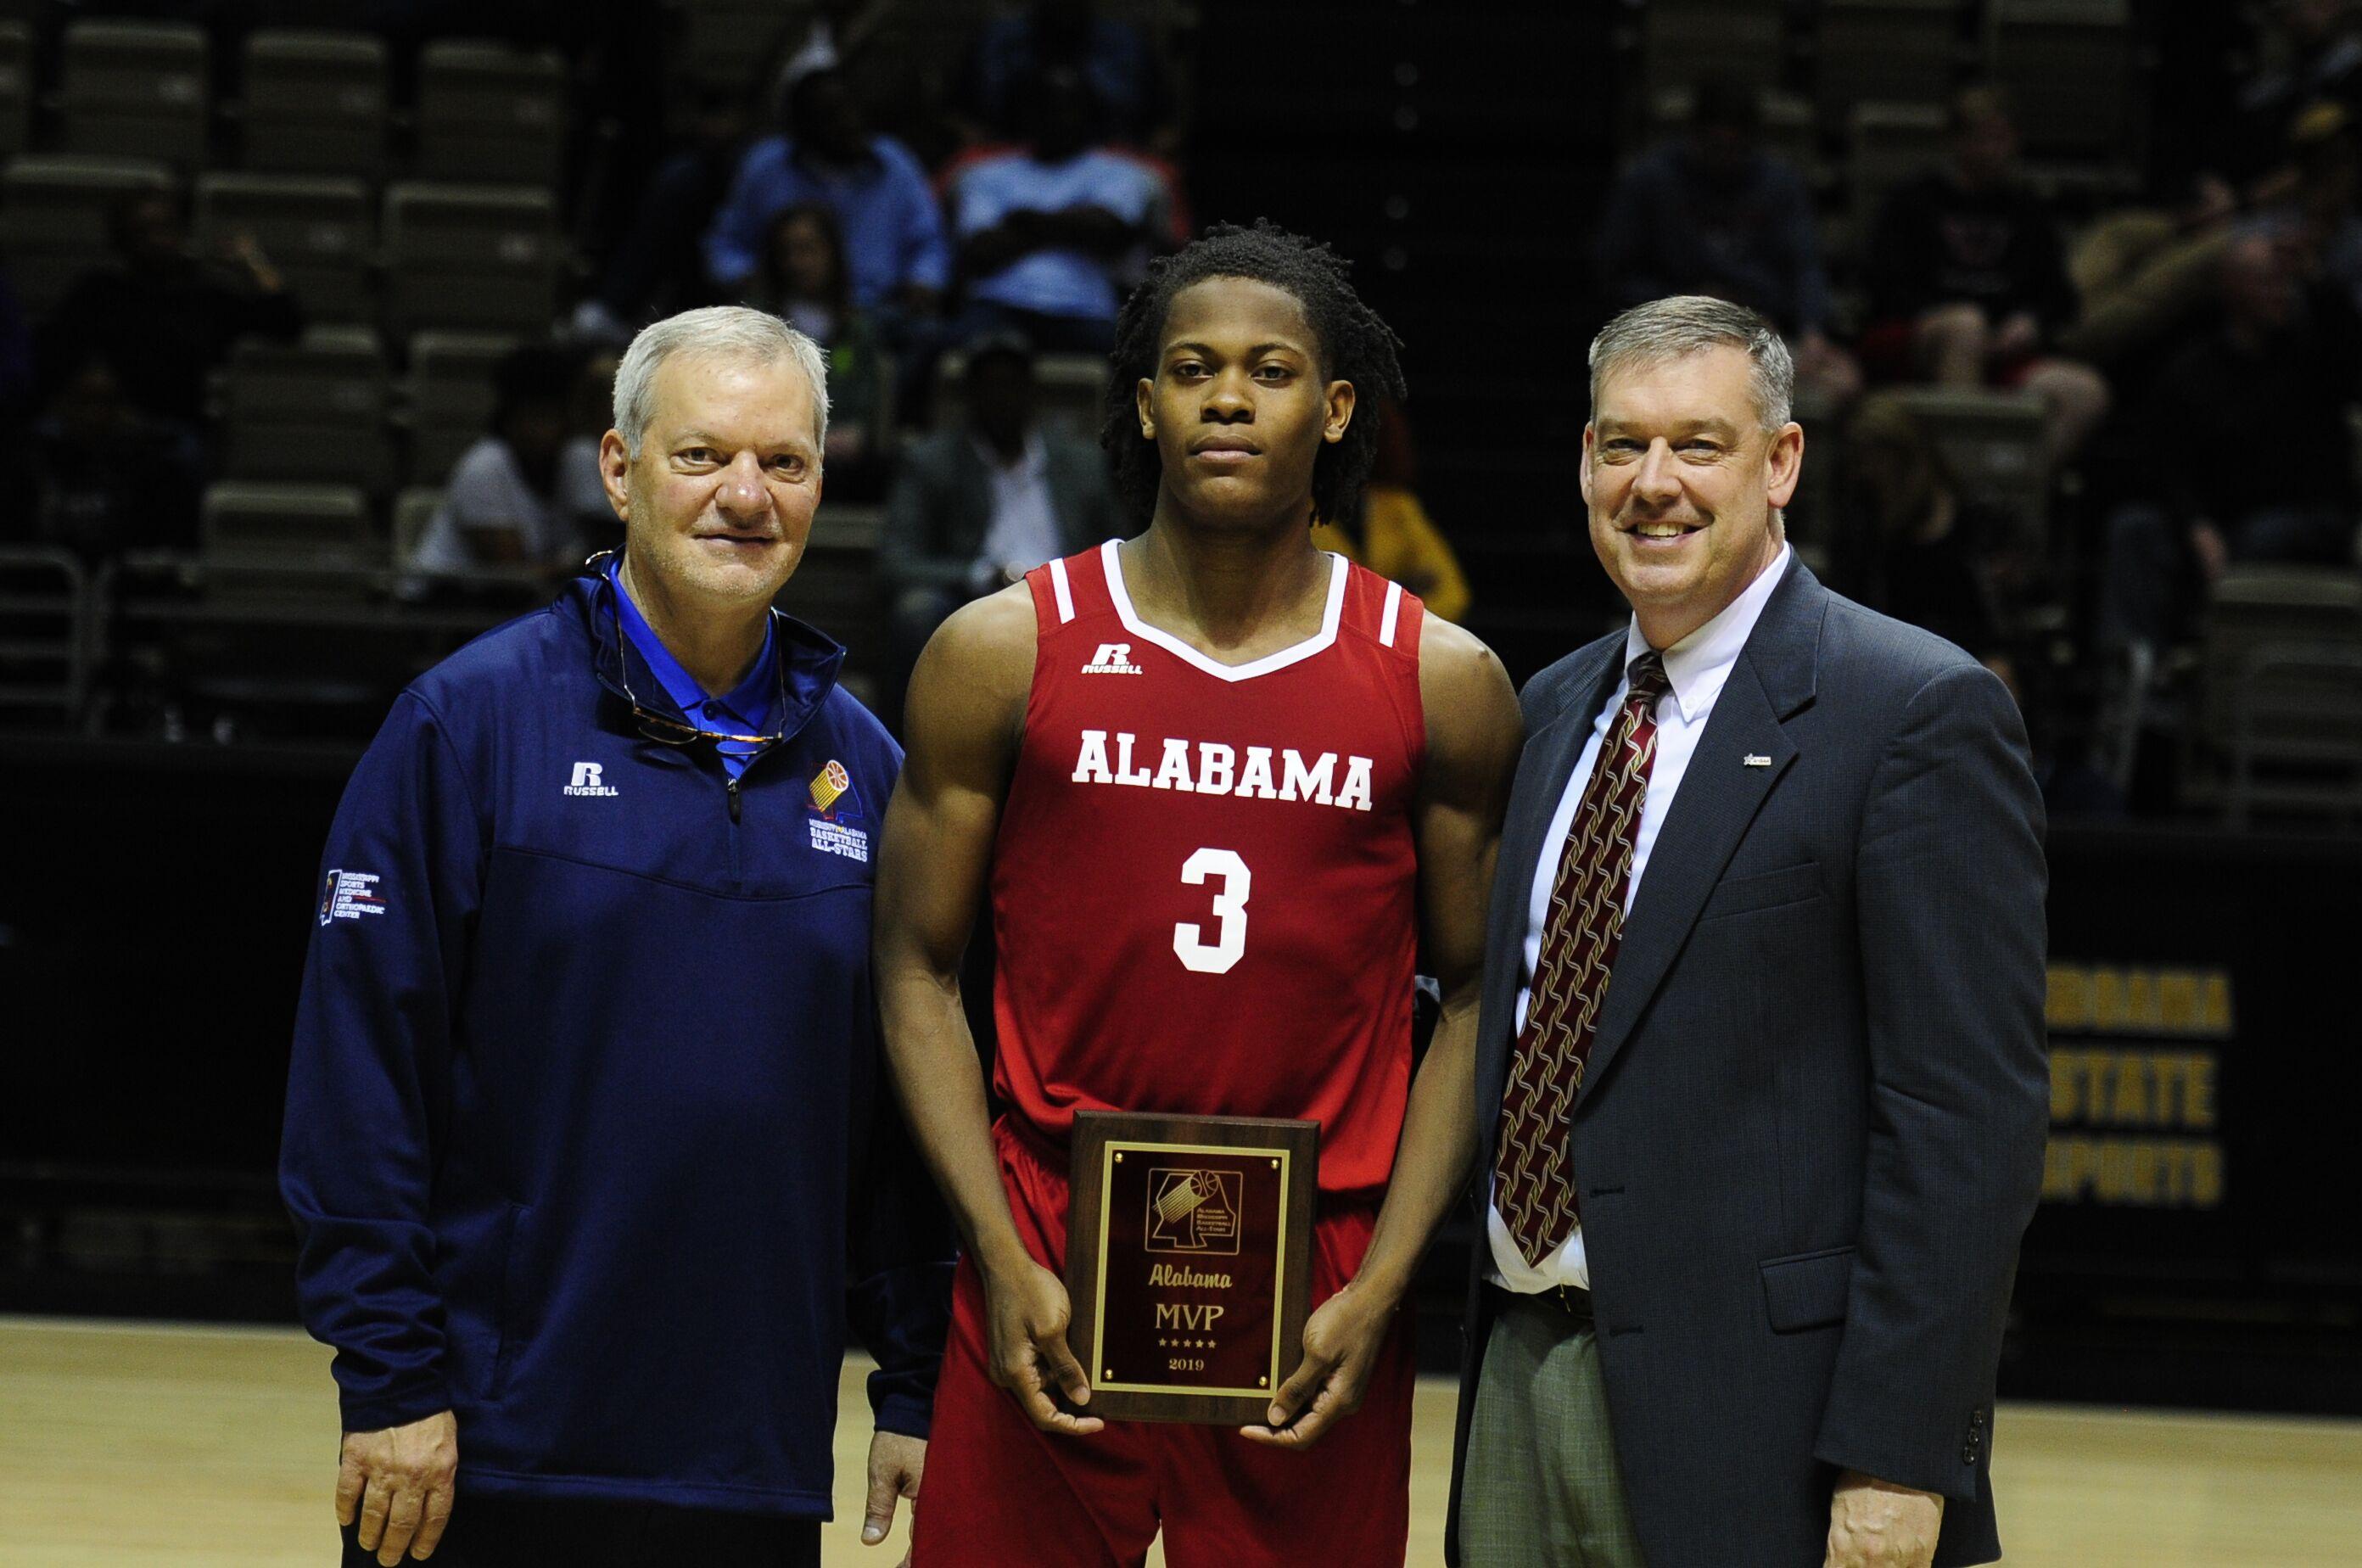 Alabama Boys 107, Mississippi Boys 90